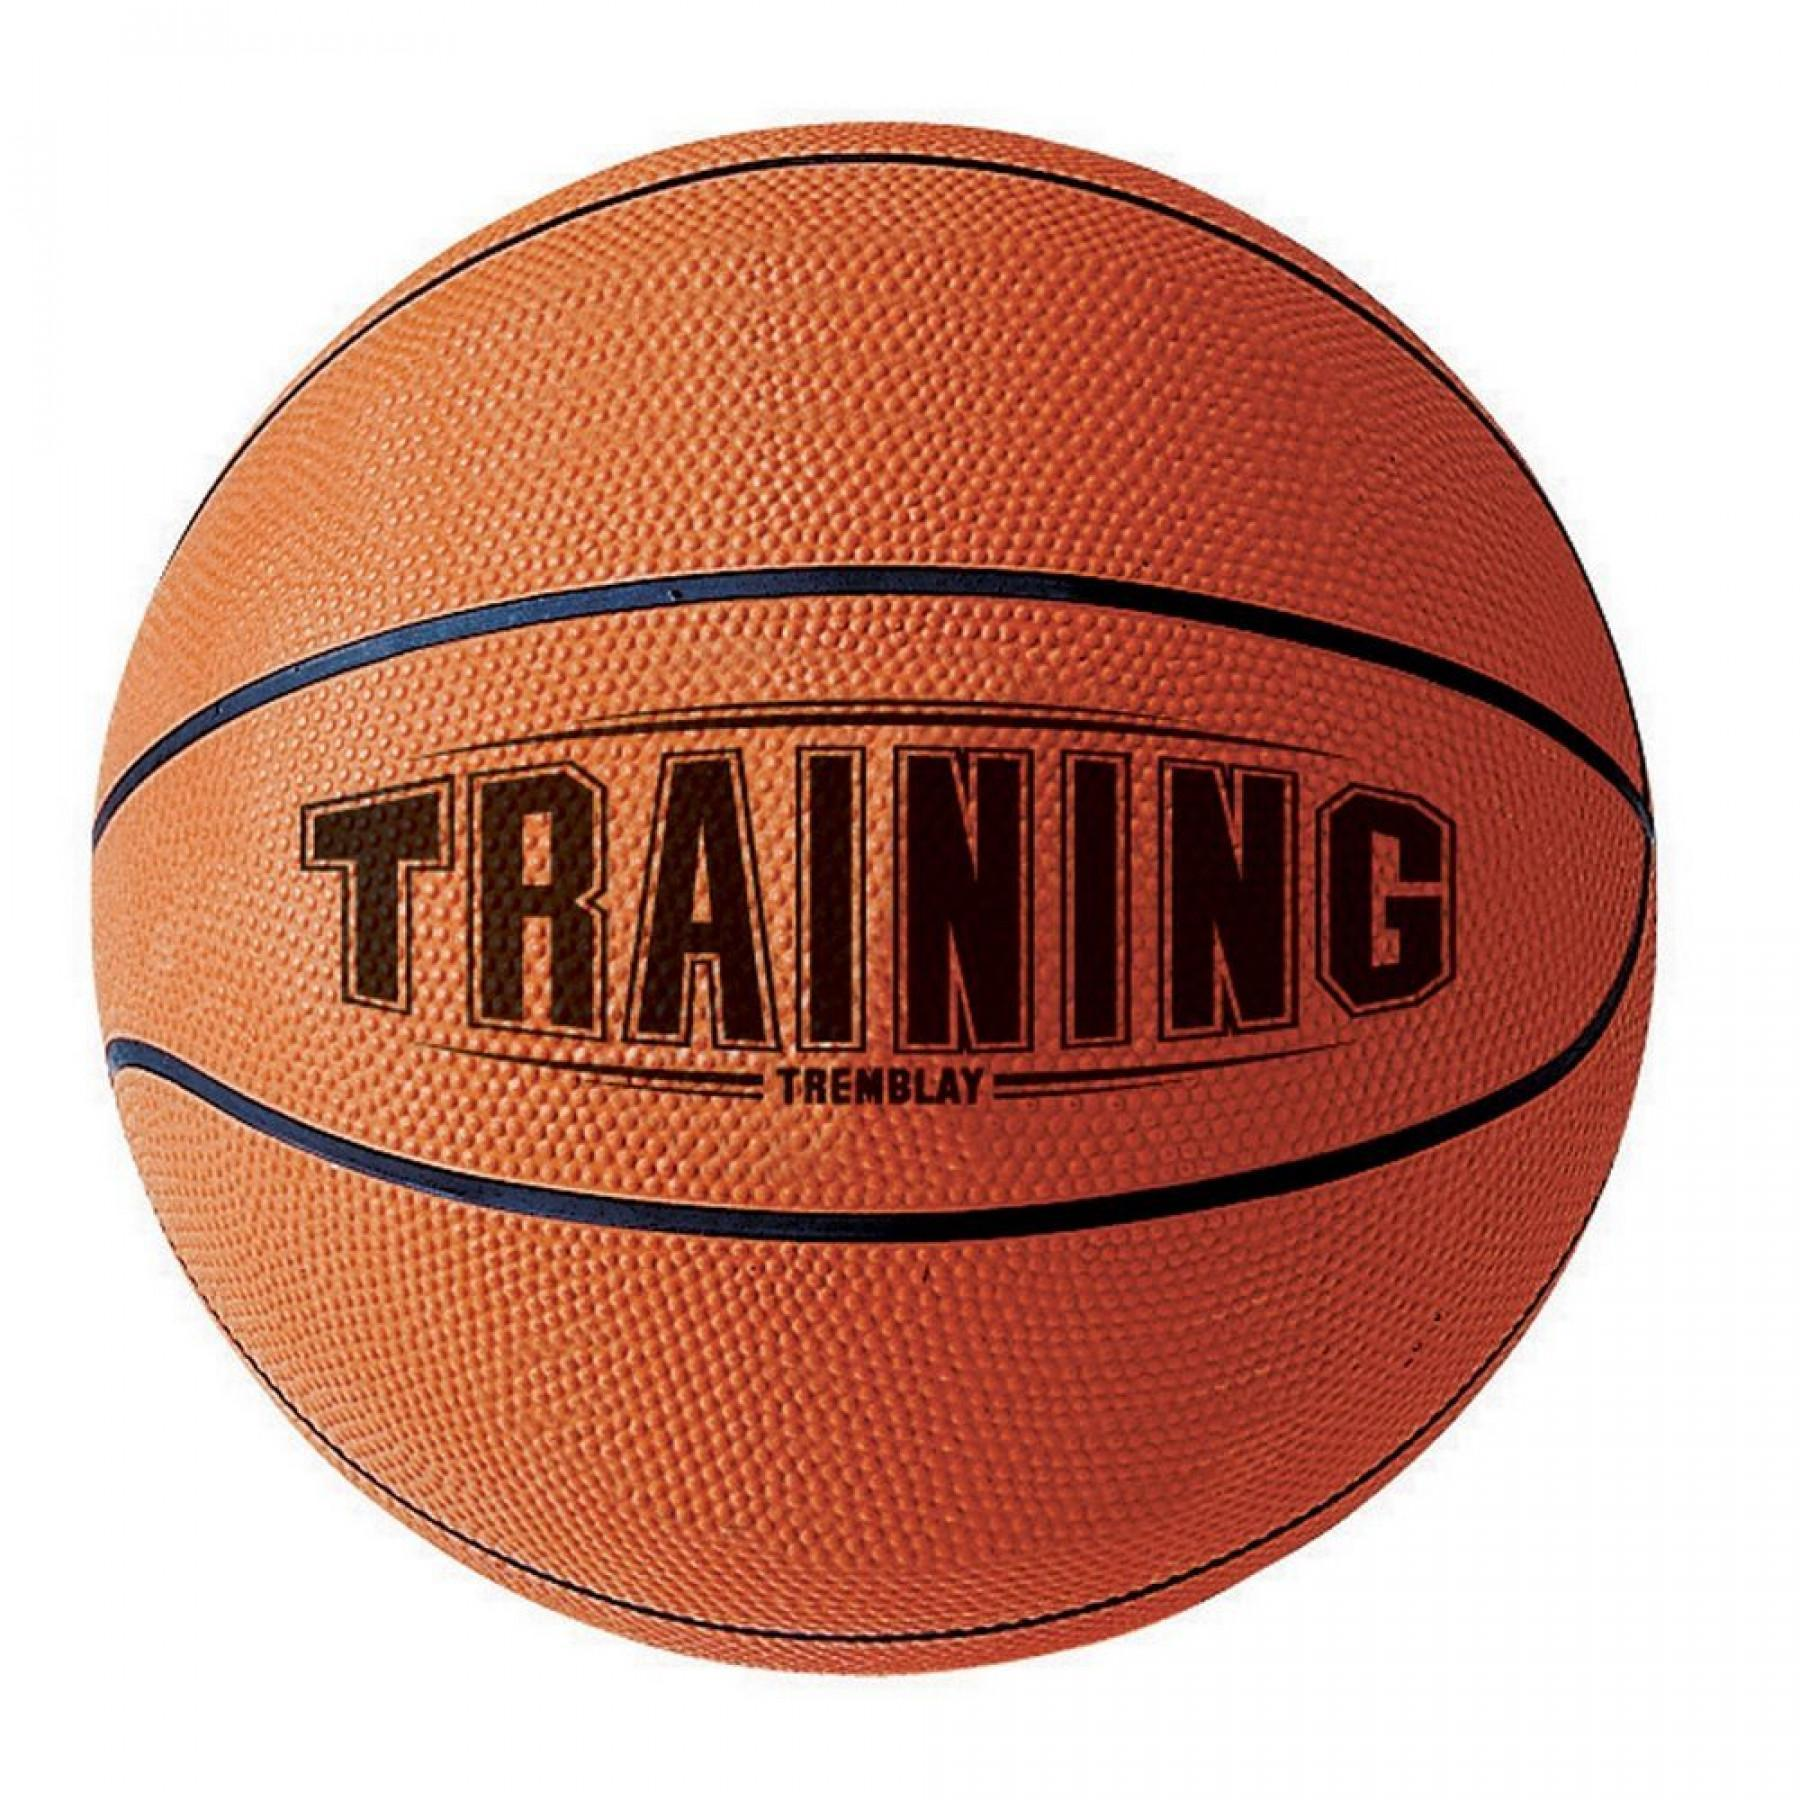 Tremblay training basketball